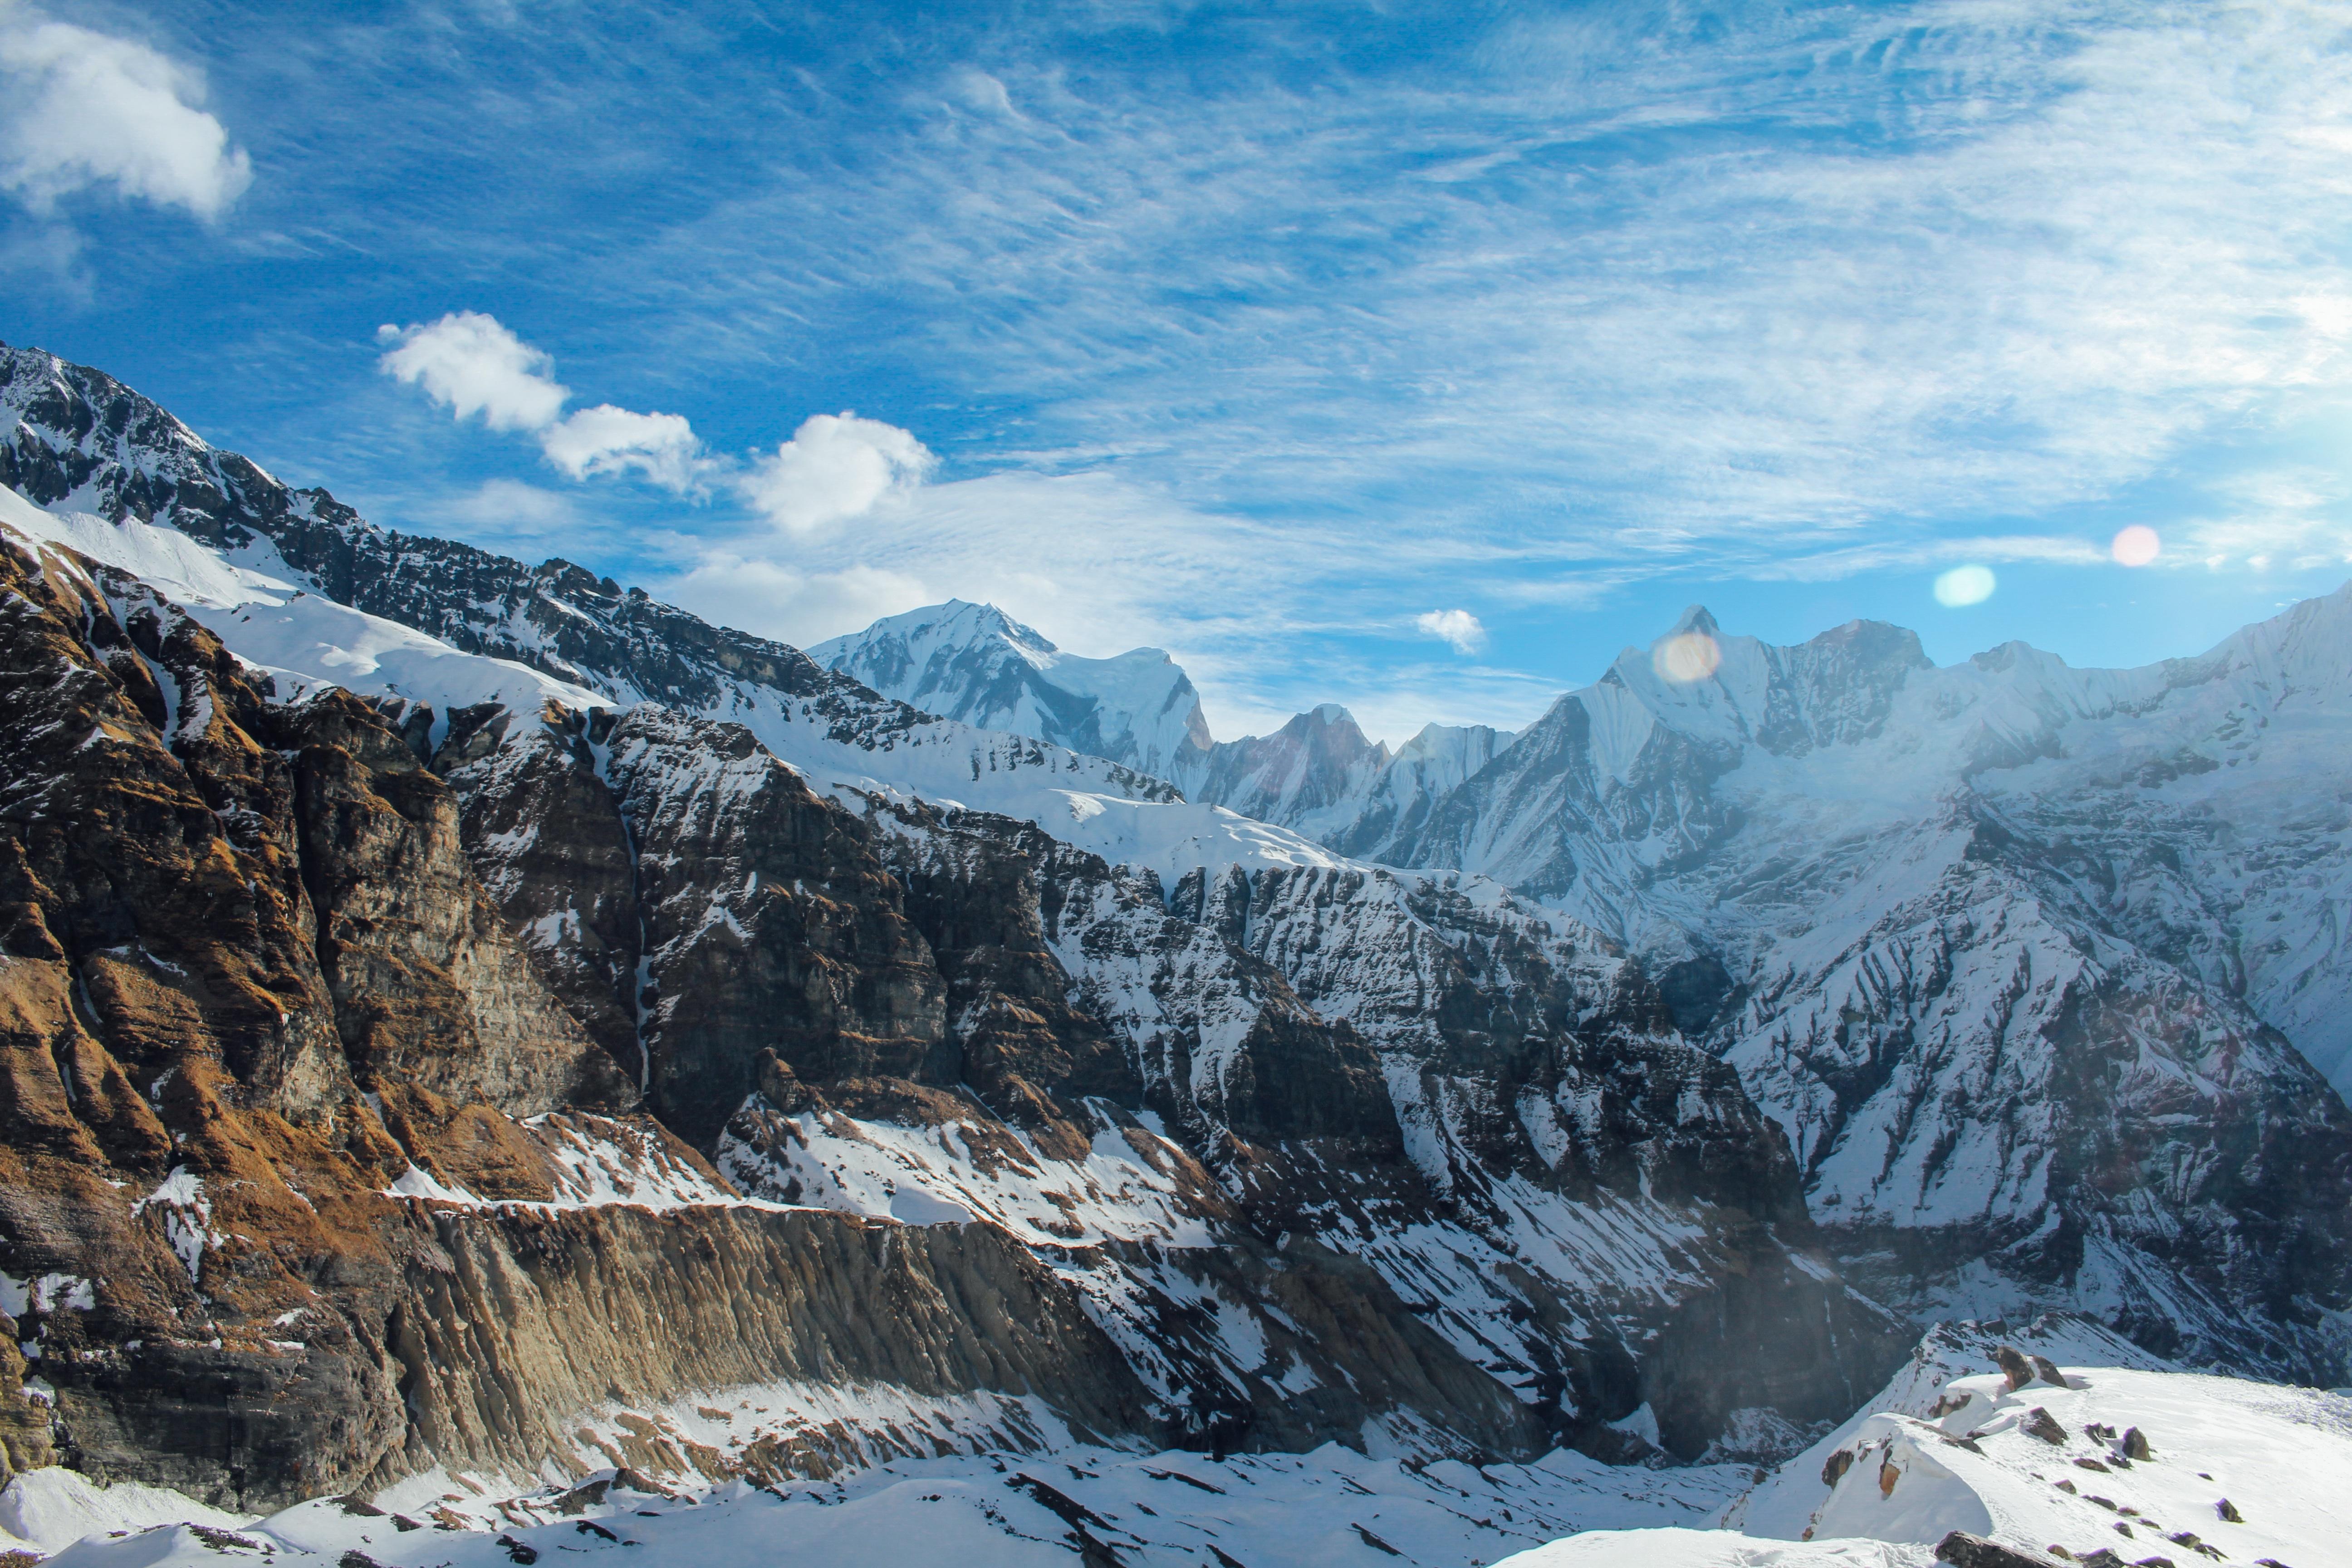 Altitude, Ice, Landscape, Mountain, Nature, HQ Photo